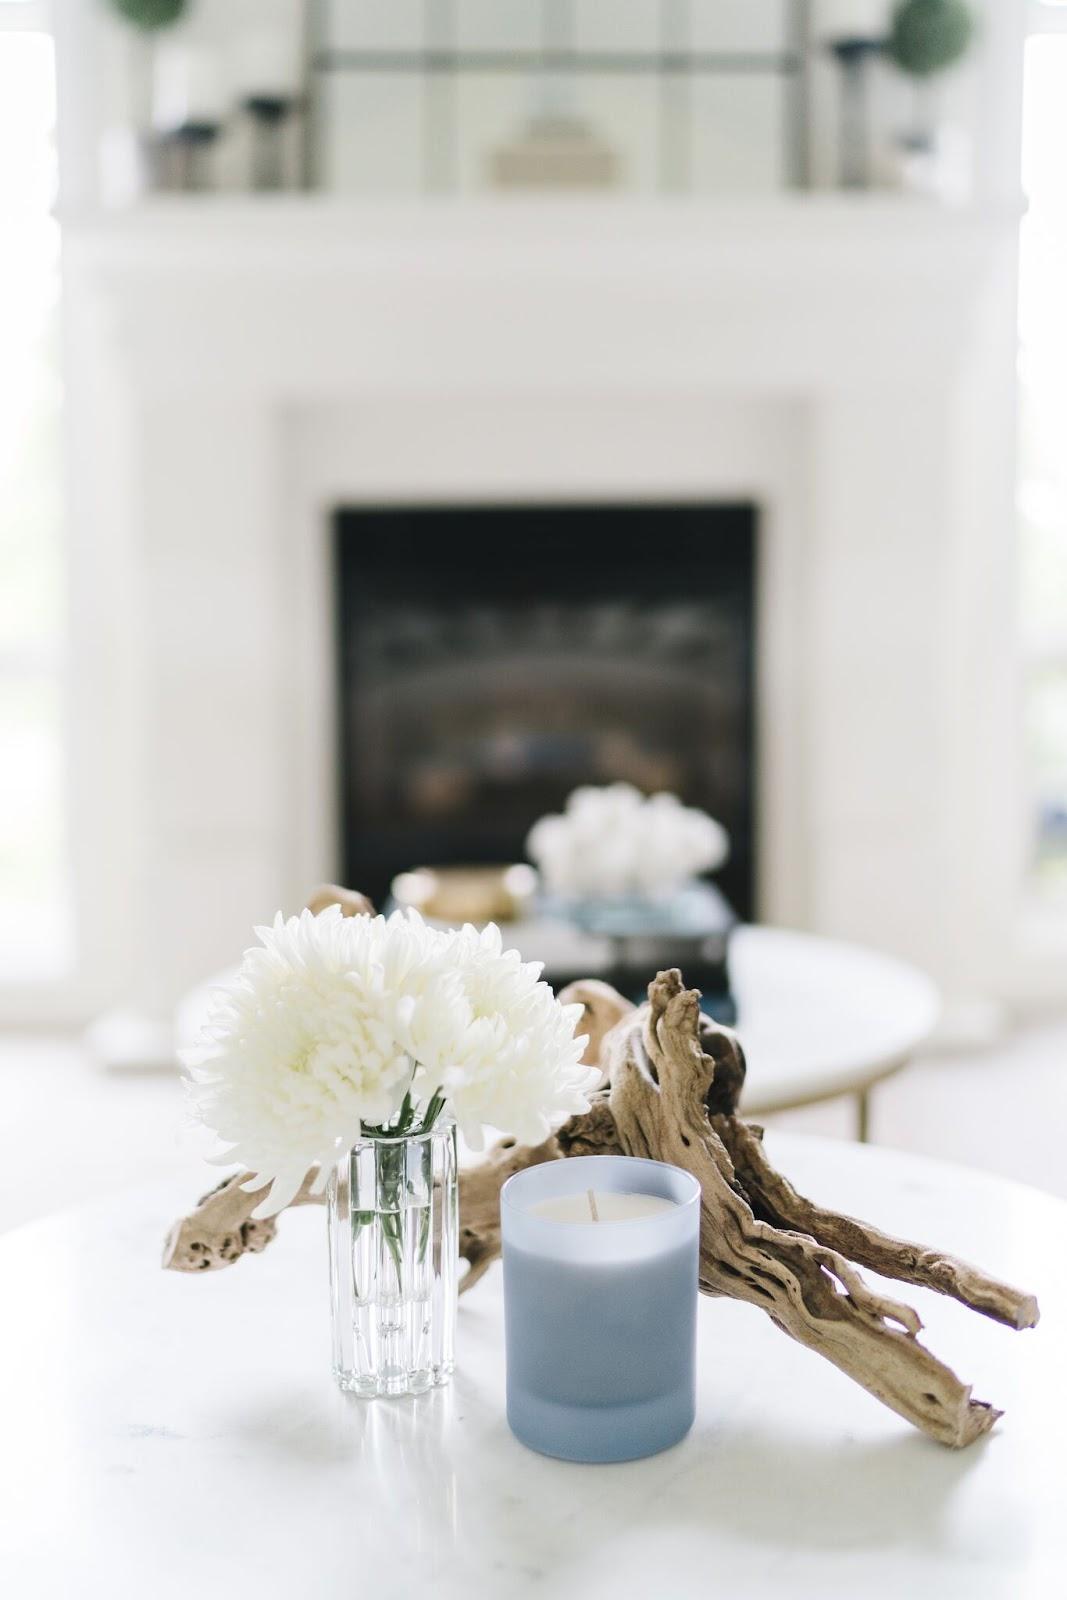 vignette white flowers powder blue candle driftwood calgary interior design living room makeover